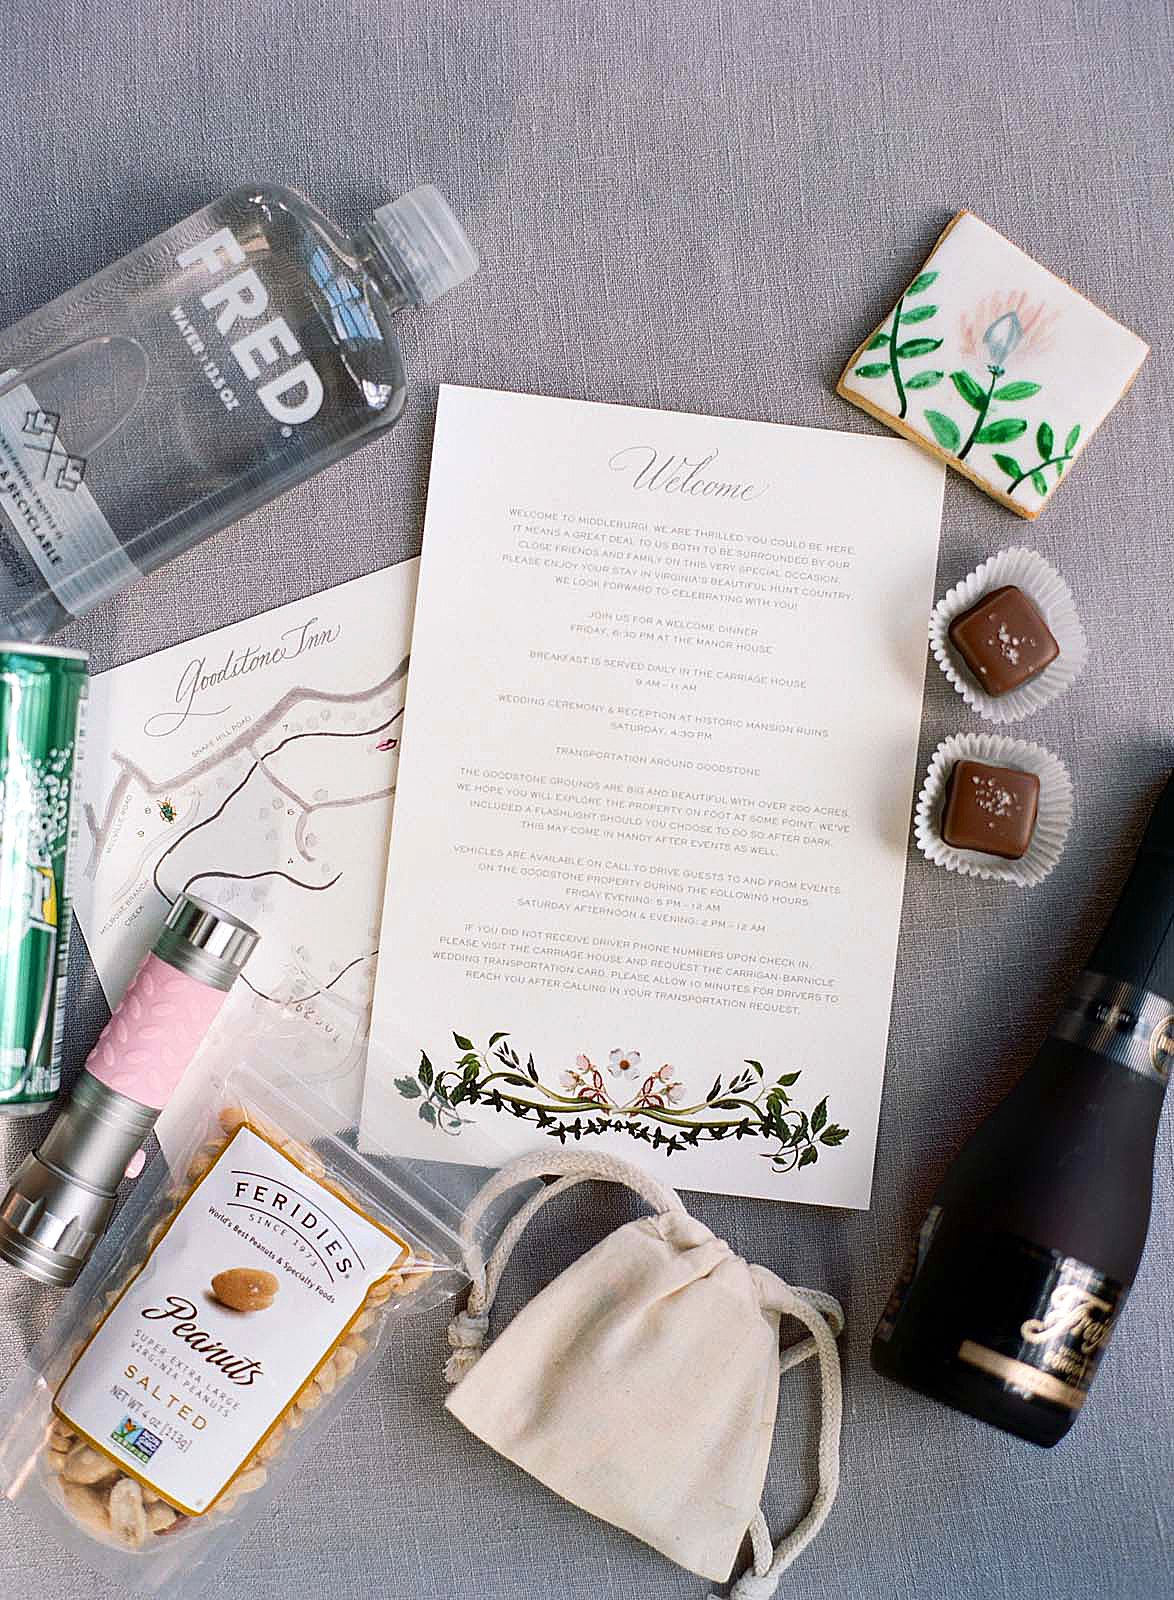 meg nick wedding welcome box inside